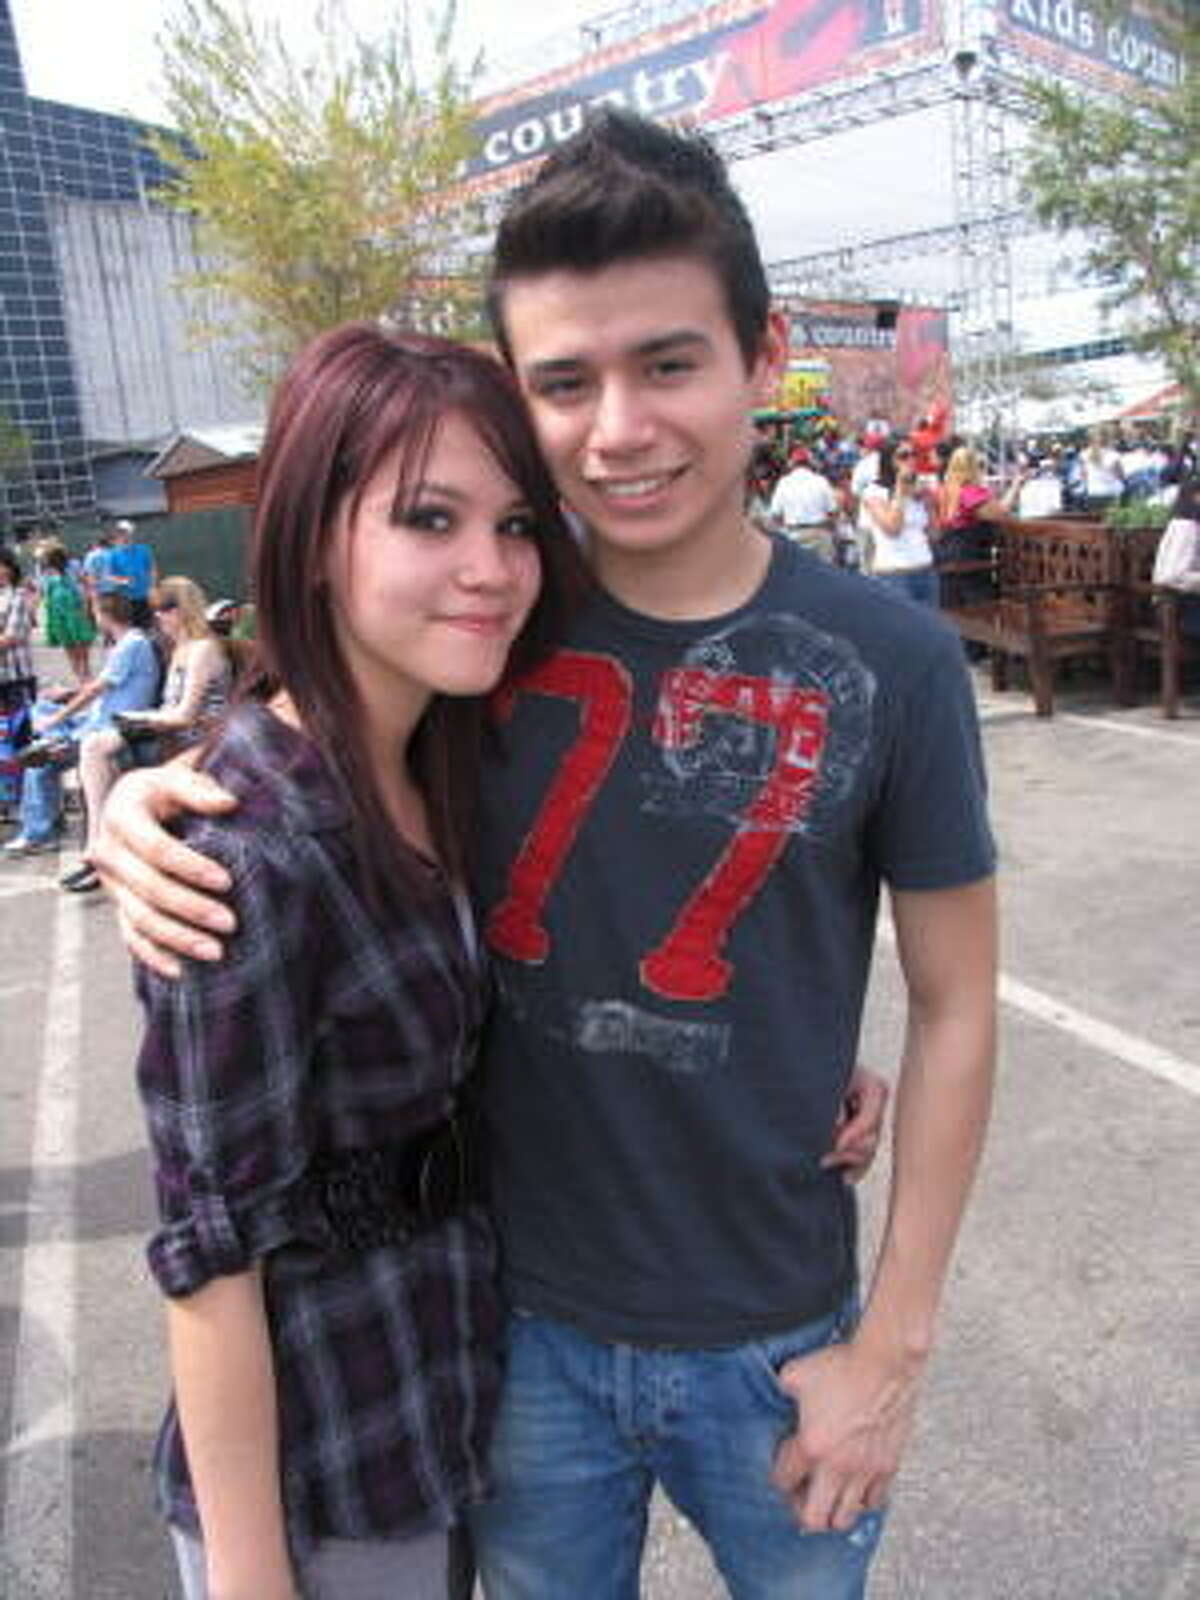 Vanessa Leal, left, and Enrique Badillo